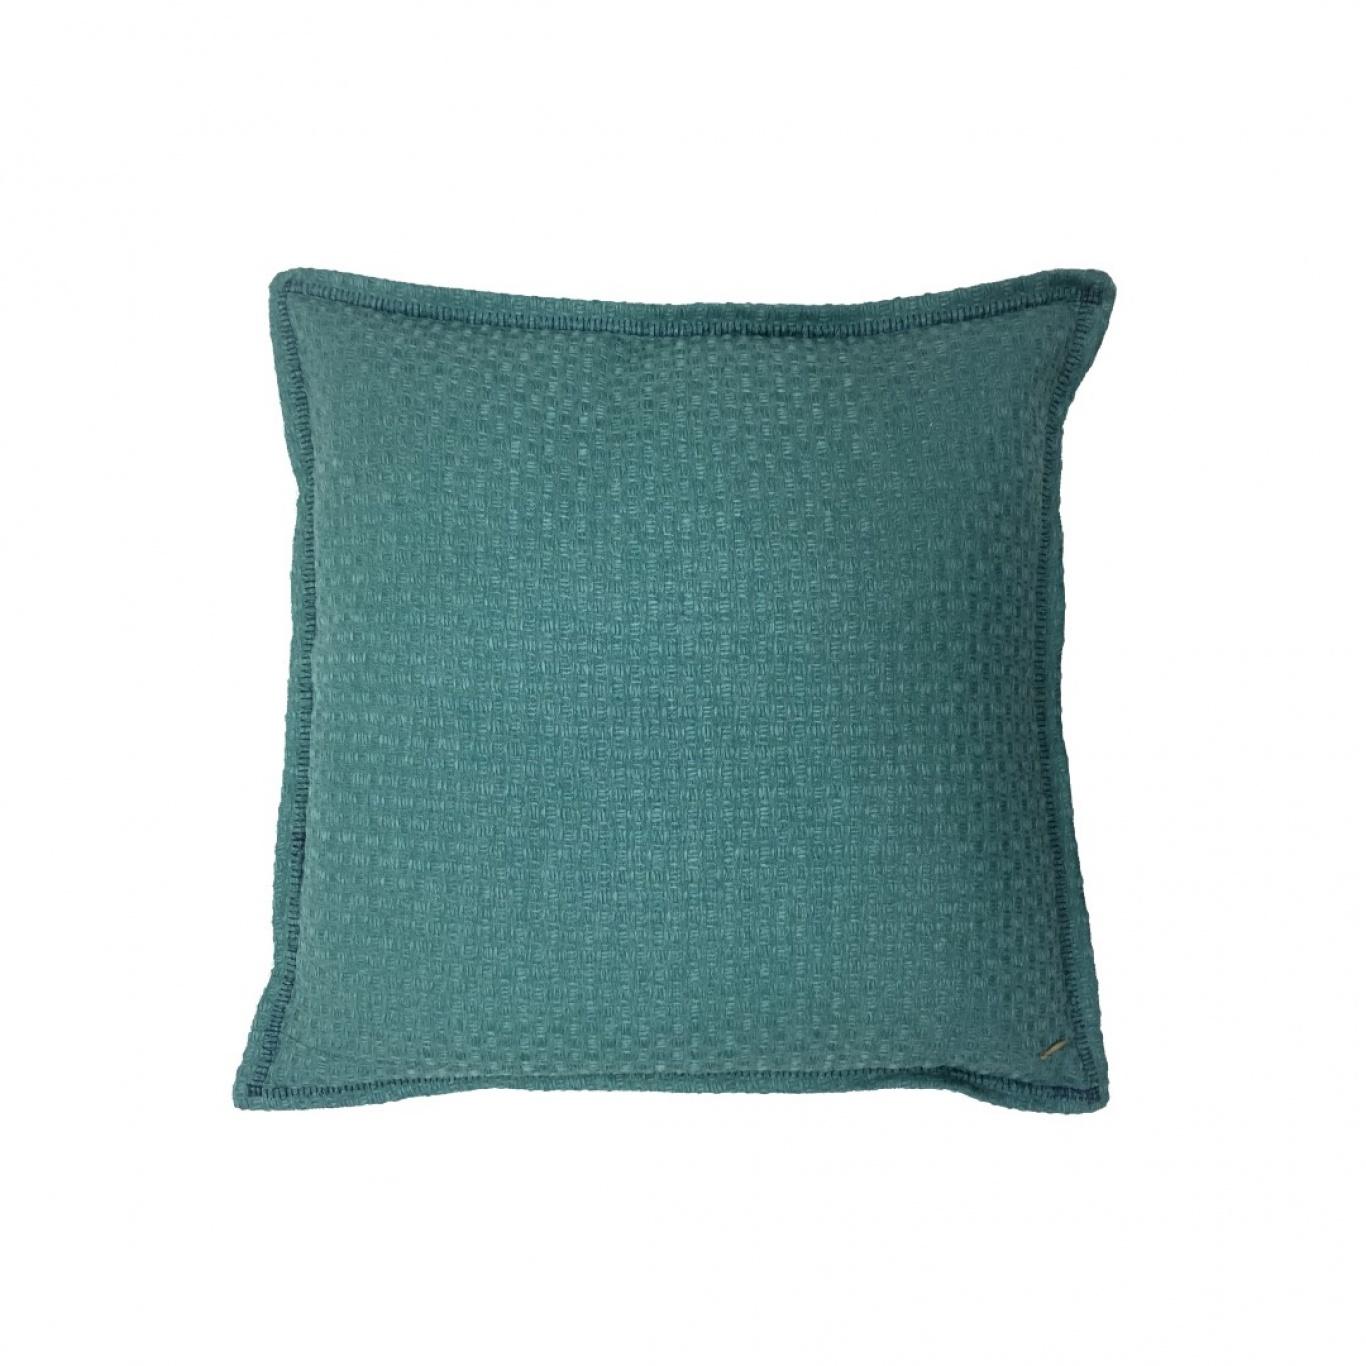 Image of Voyage Nessa Ocean Cushion